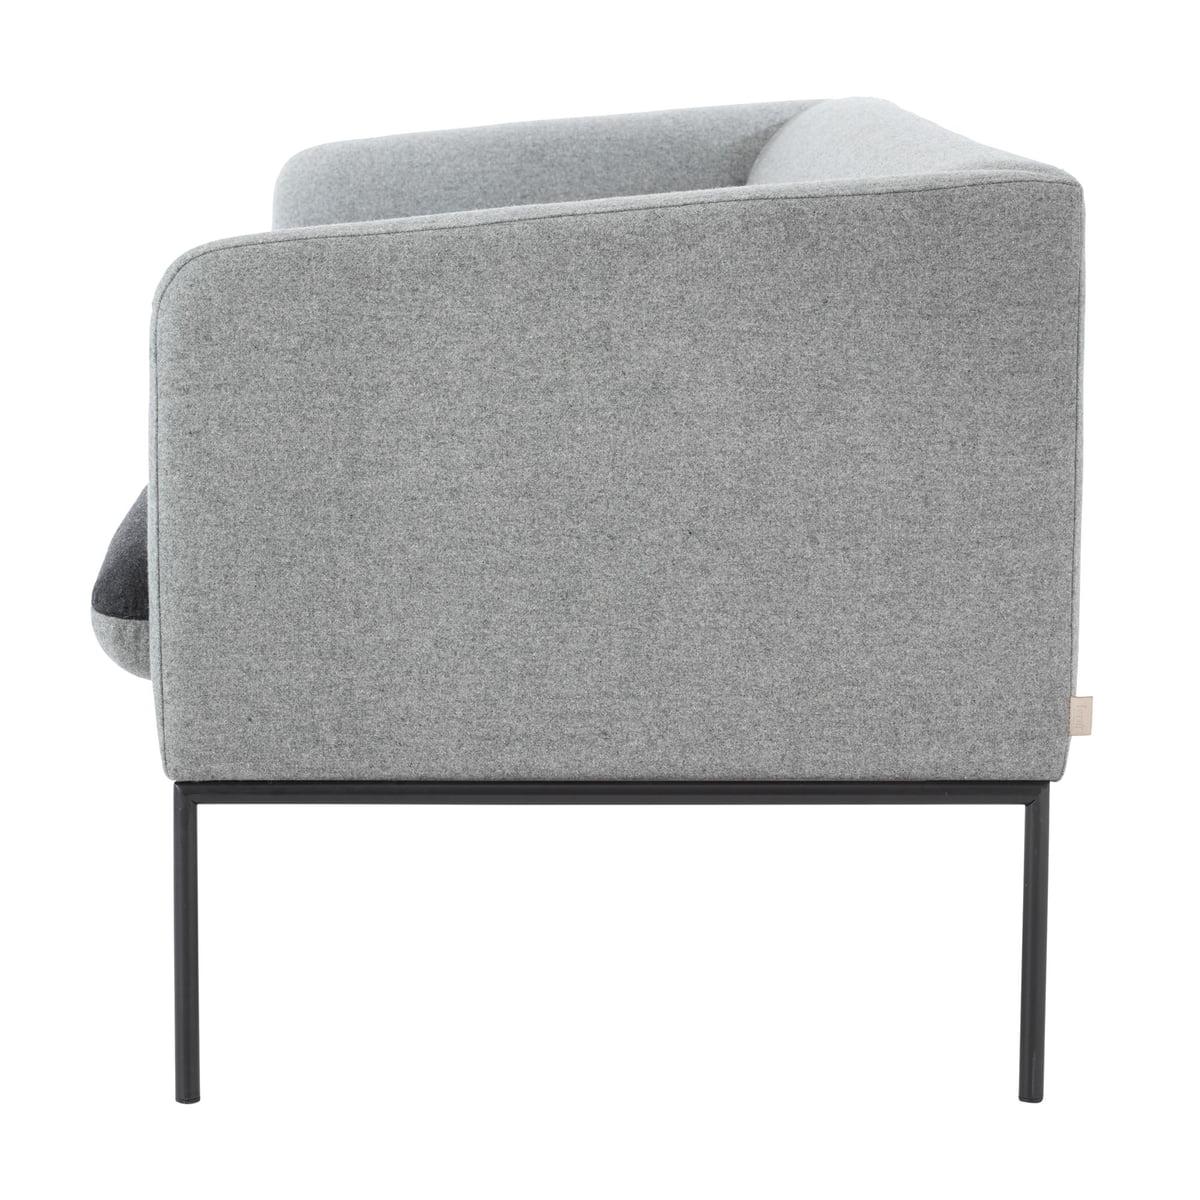 turn sofa 2 sitzer von ferm living connox. Black Bedroom Furniture Sets. Home Design Ideas